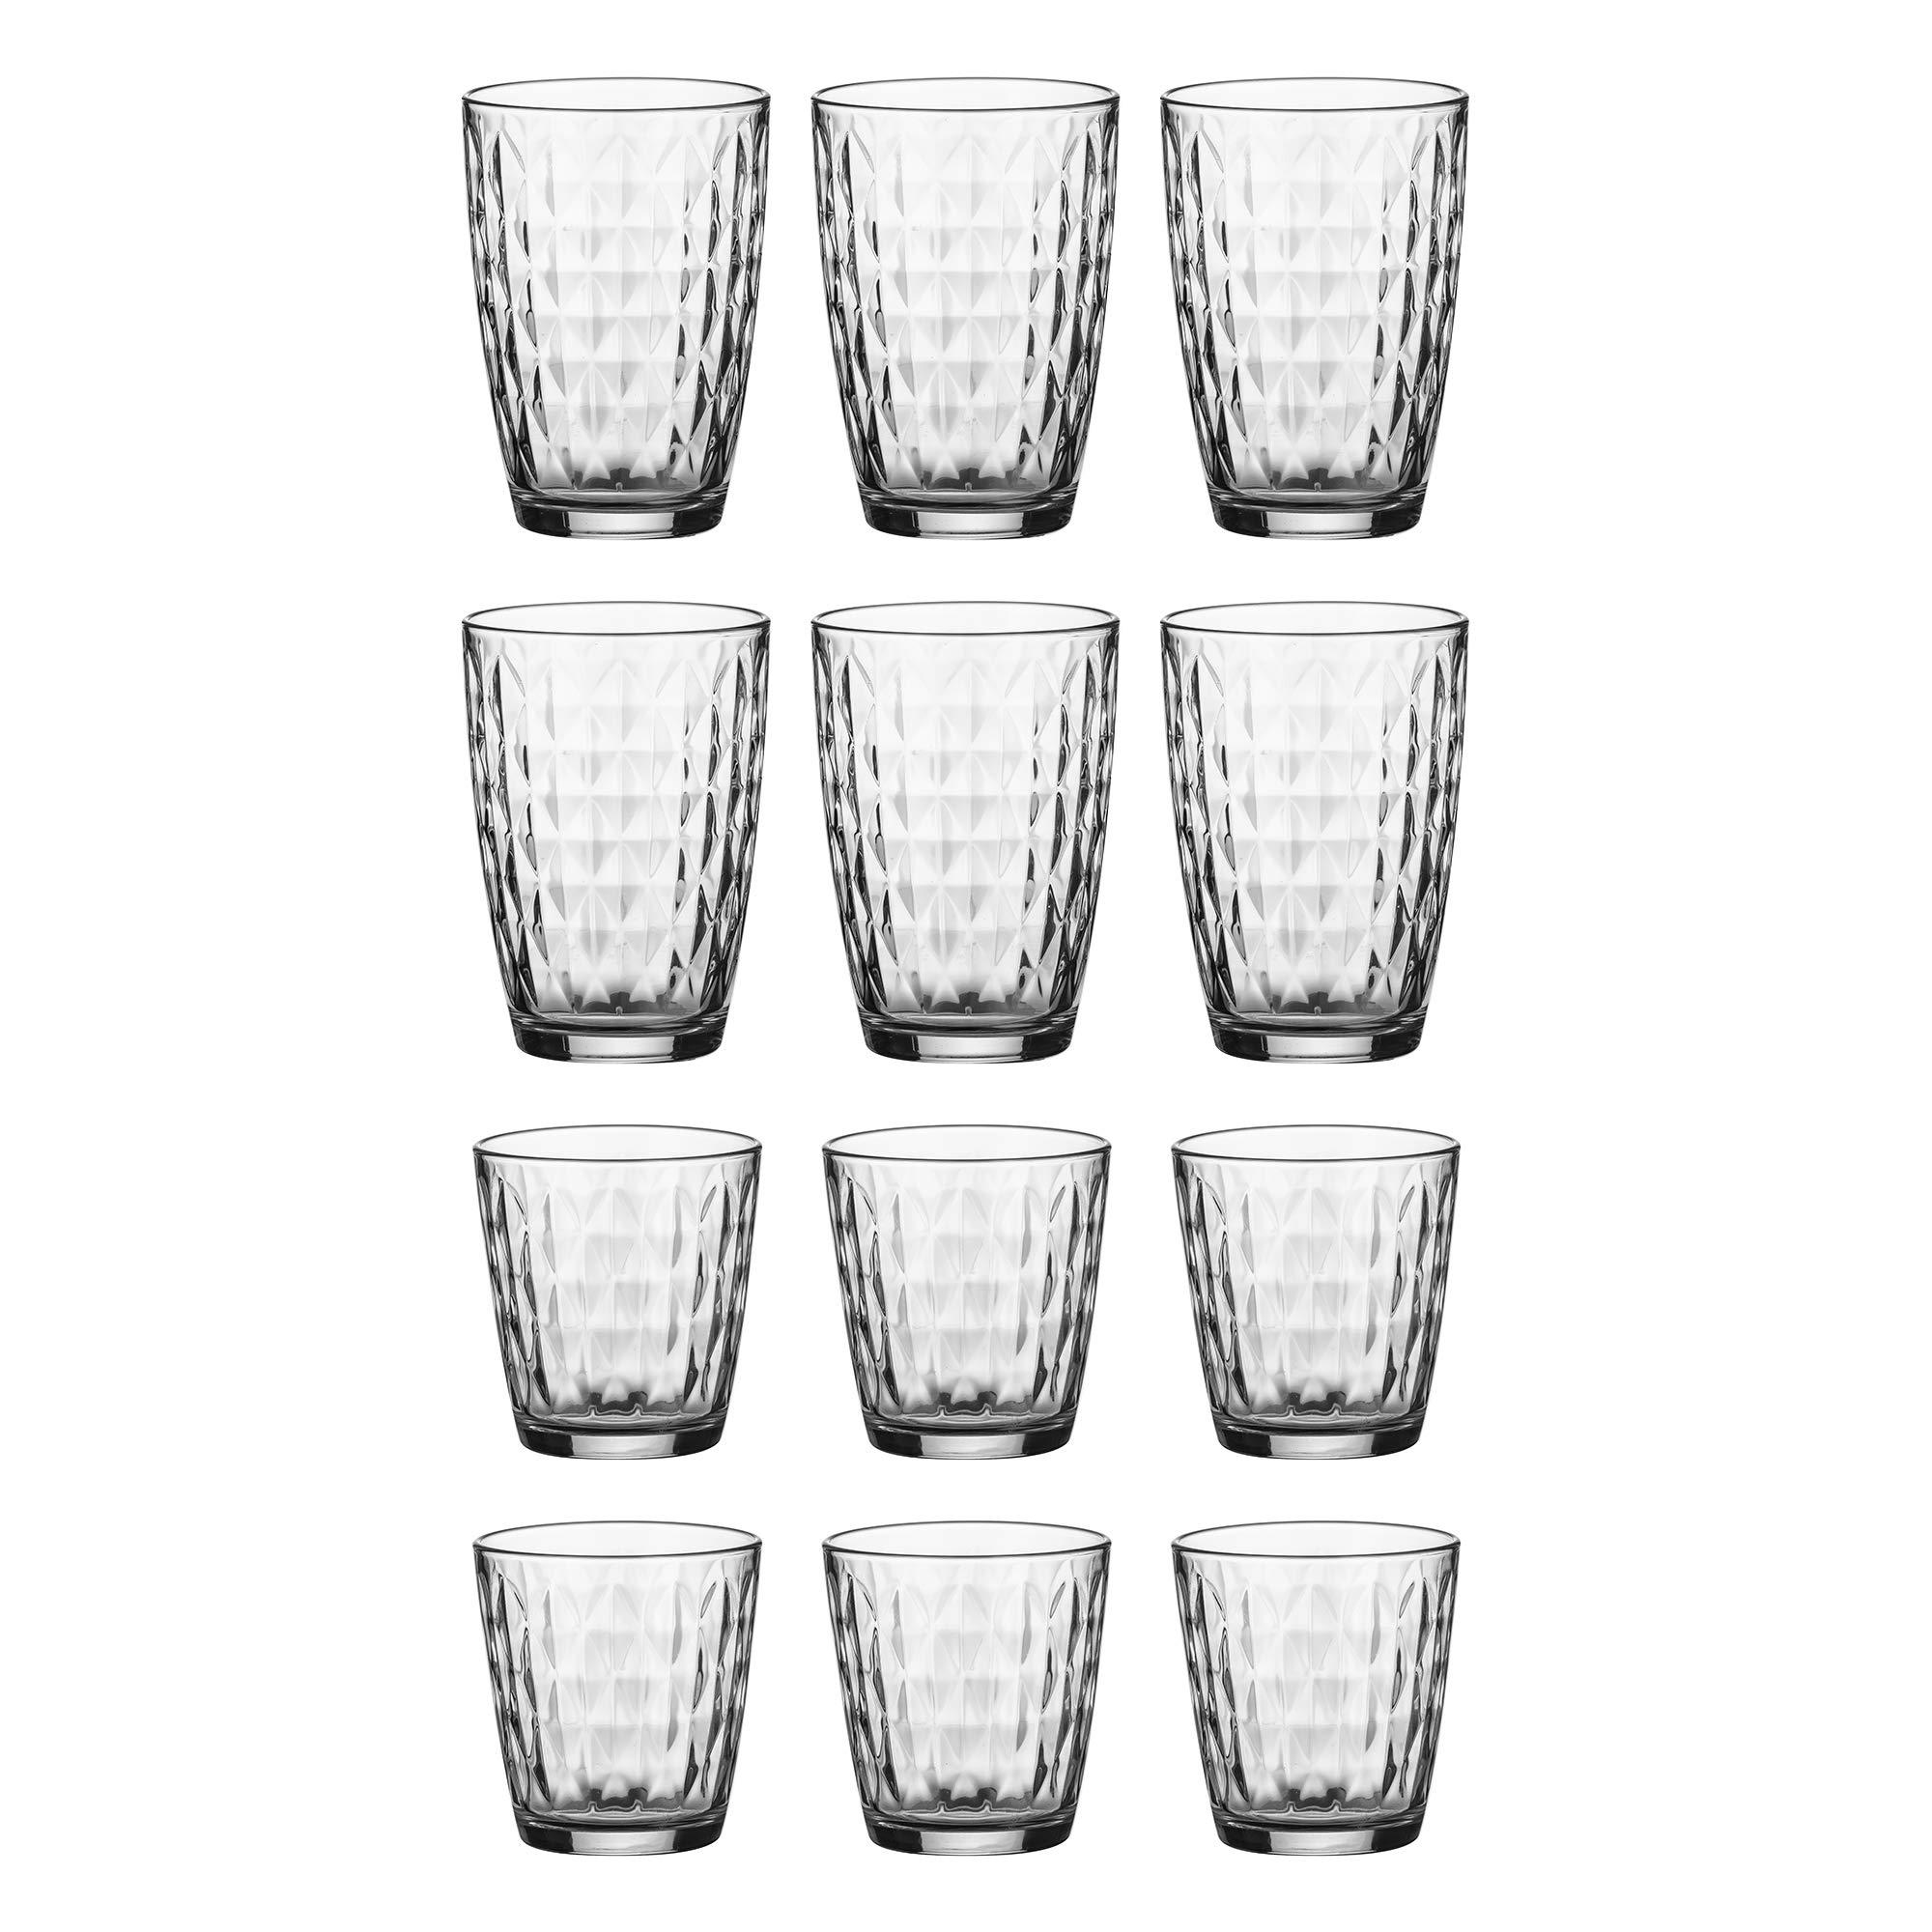 Ravenhead 0040.482 Essentials 12 Piece Jewel Tumbler Set, Glass by Ravenhead